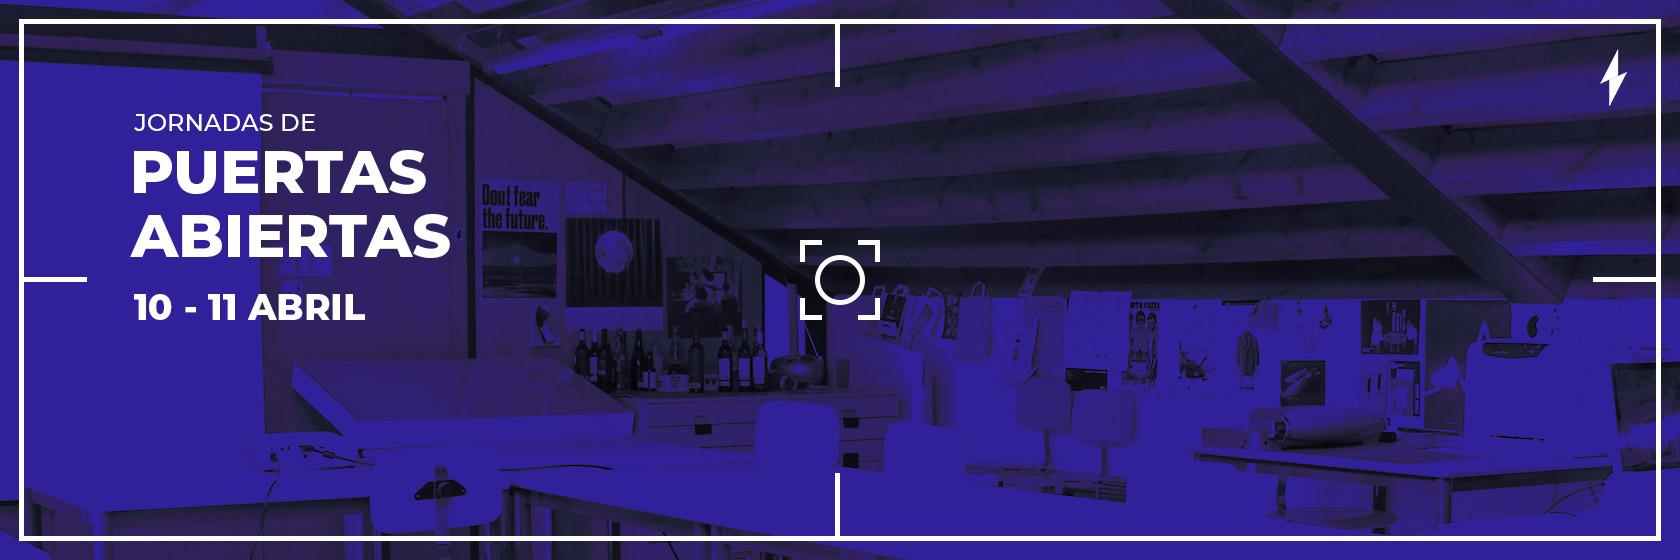 Imagen de un aula del centro tintada de azul vista a través de la pantalla de un móvil o cámara, con el texto